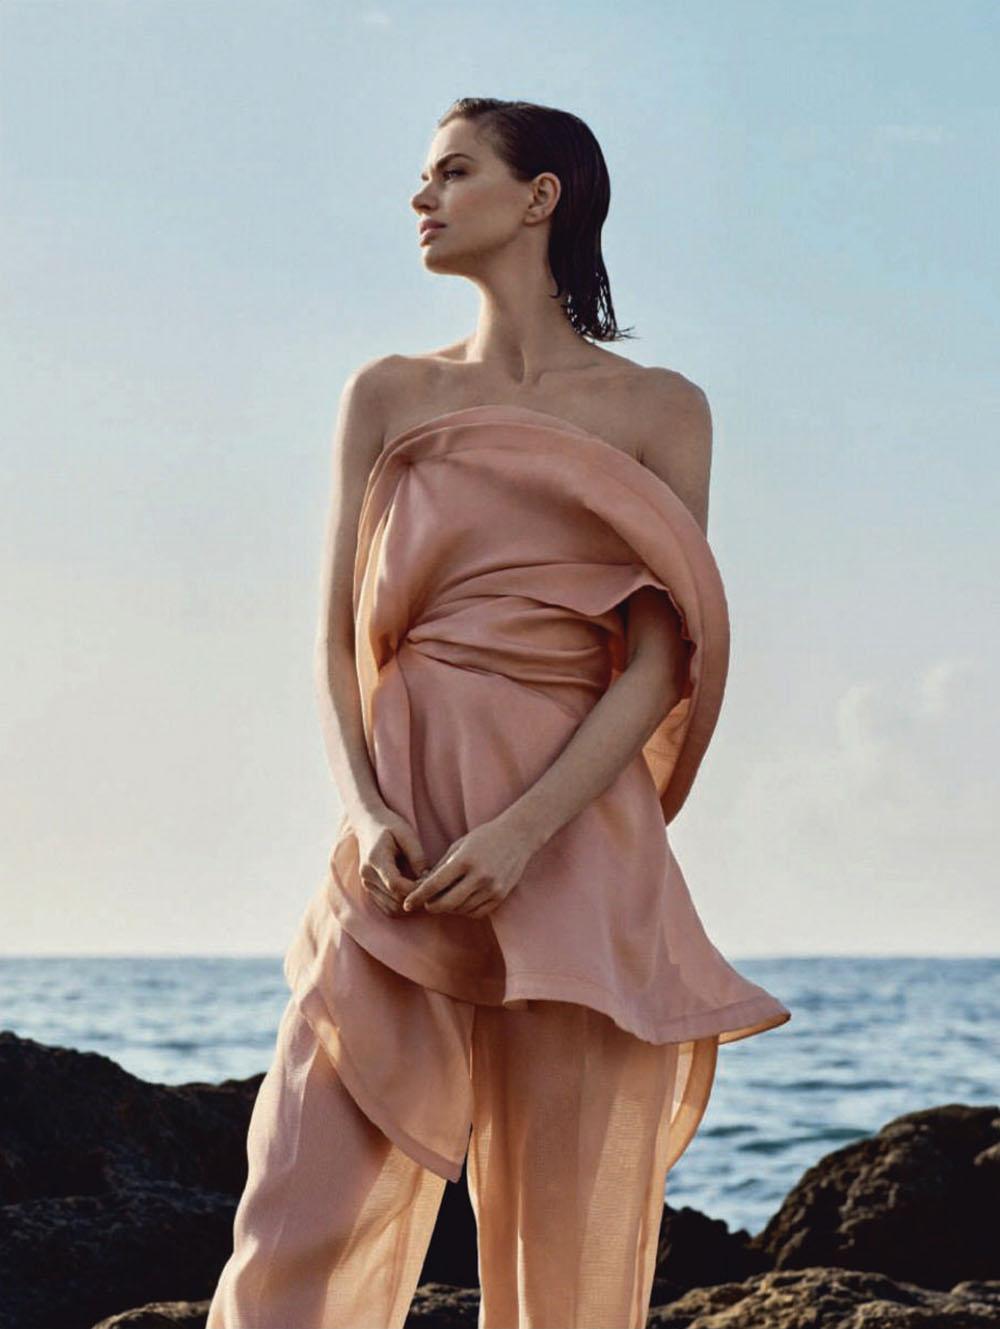 Rianne ten Haken by Javier Lopez for Harper's Bazaar Spain April 2020